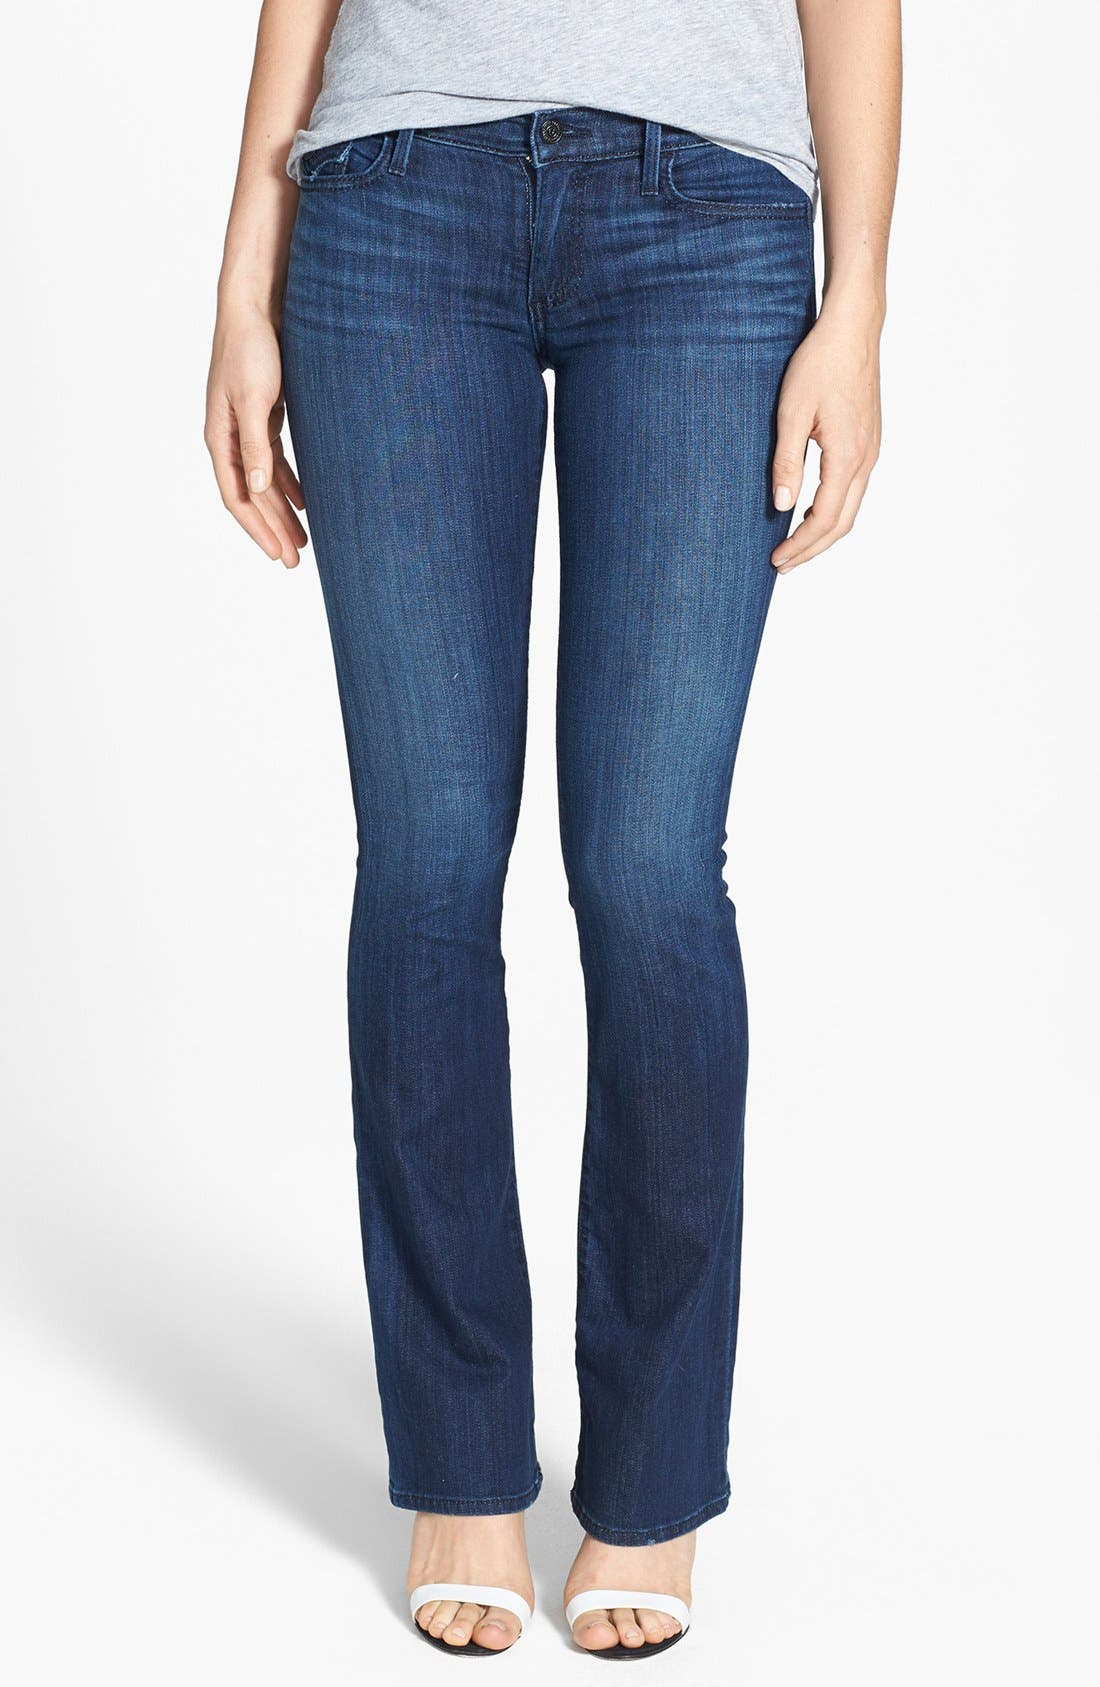 Main Image - True Religion Brand Jeans 'Becca' Bootcut Jeans (Faithful Message)